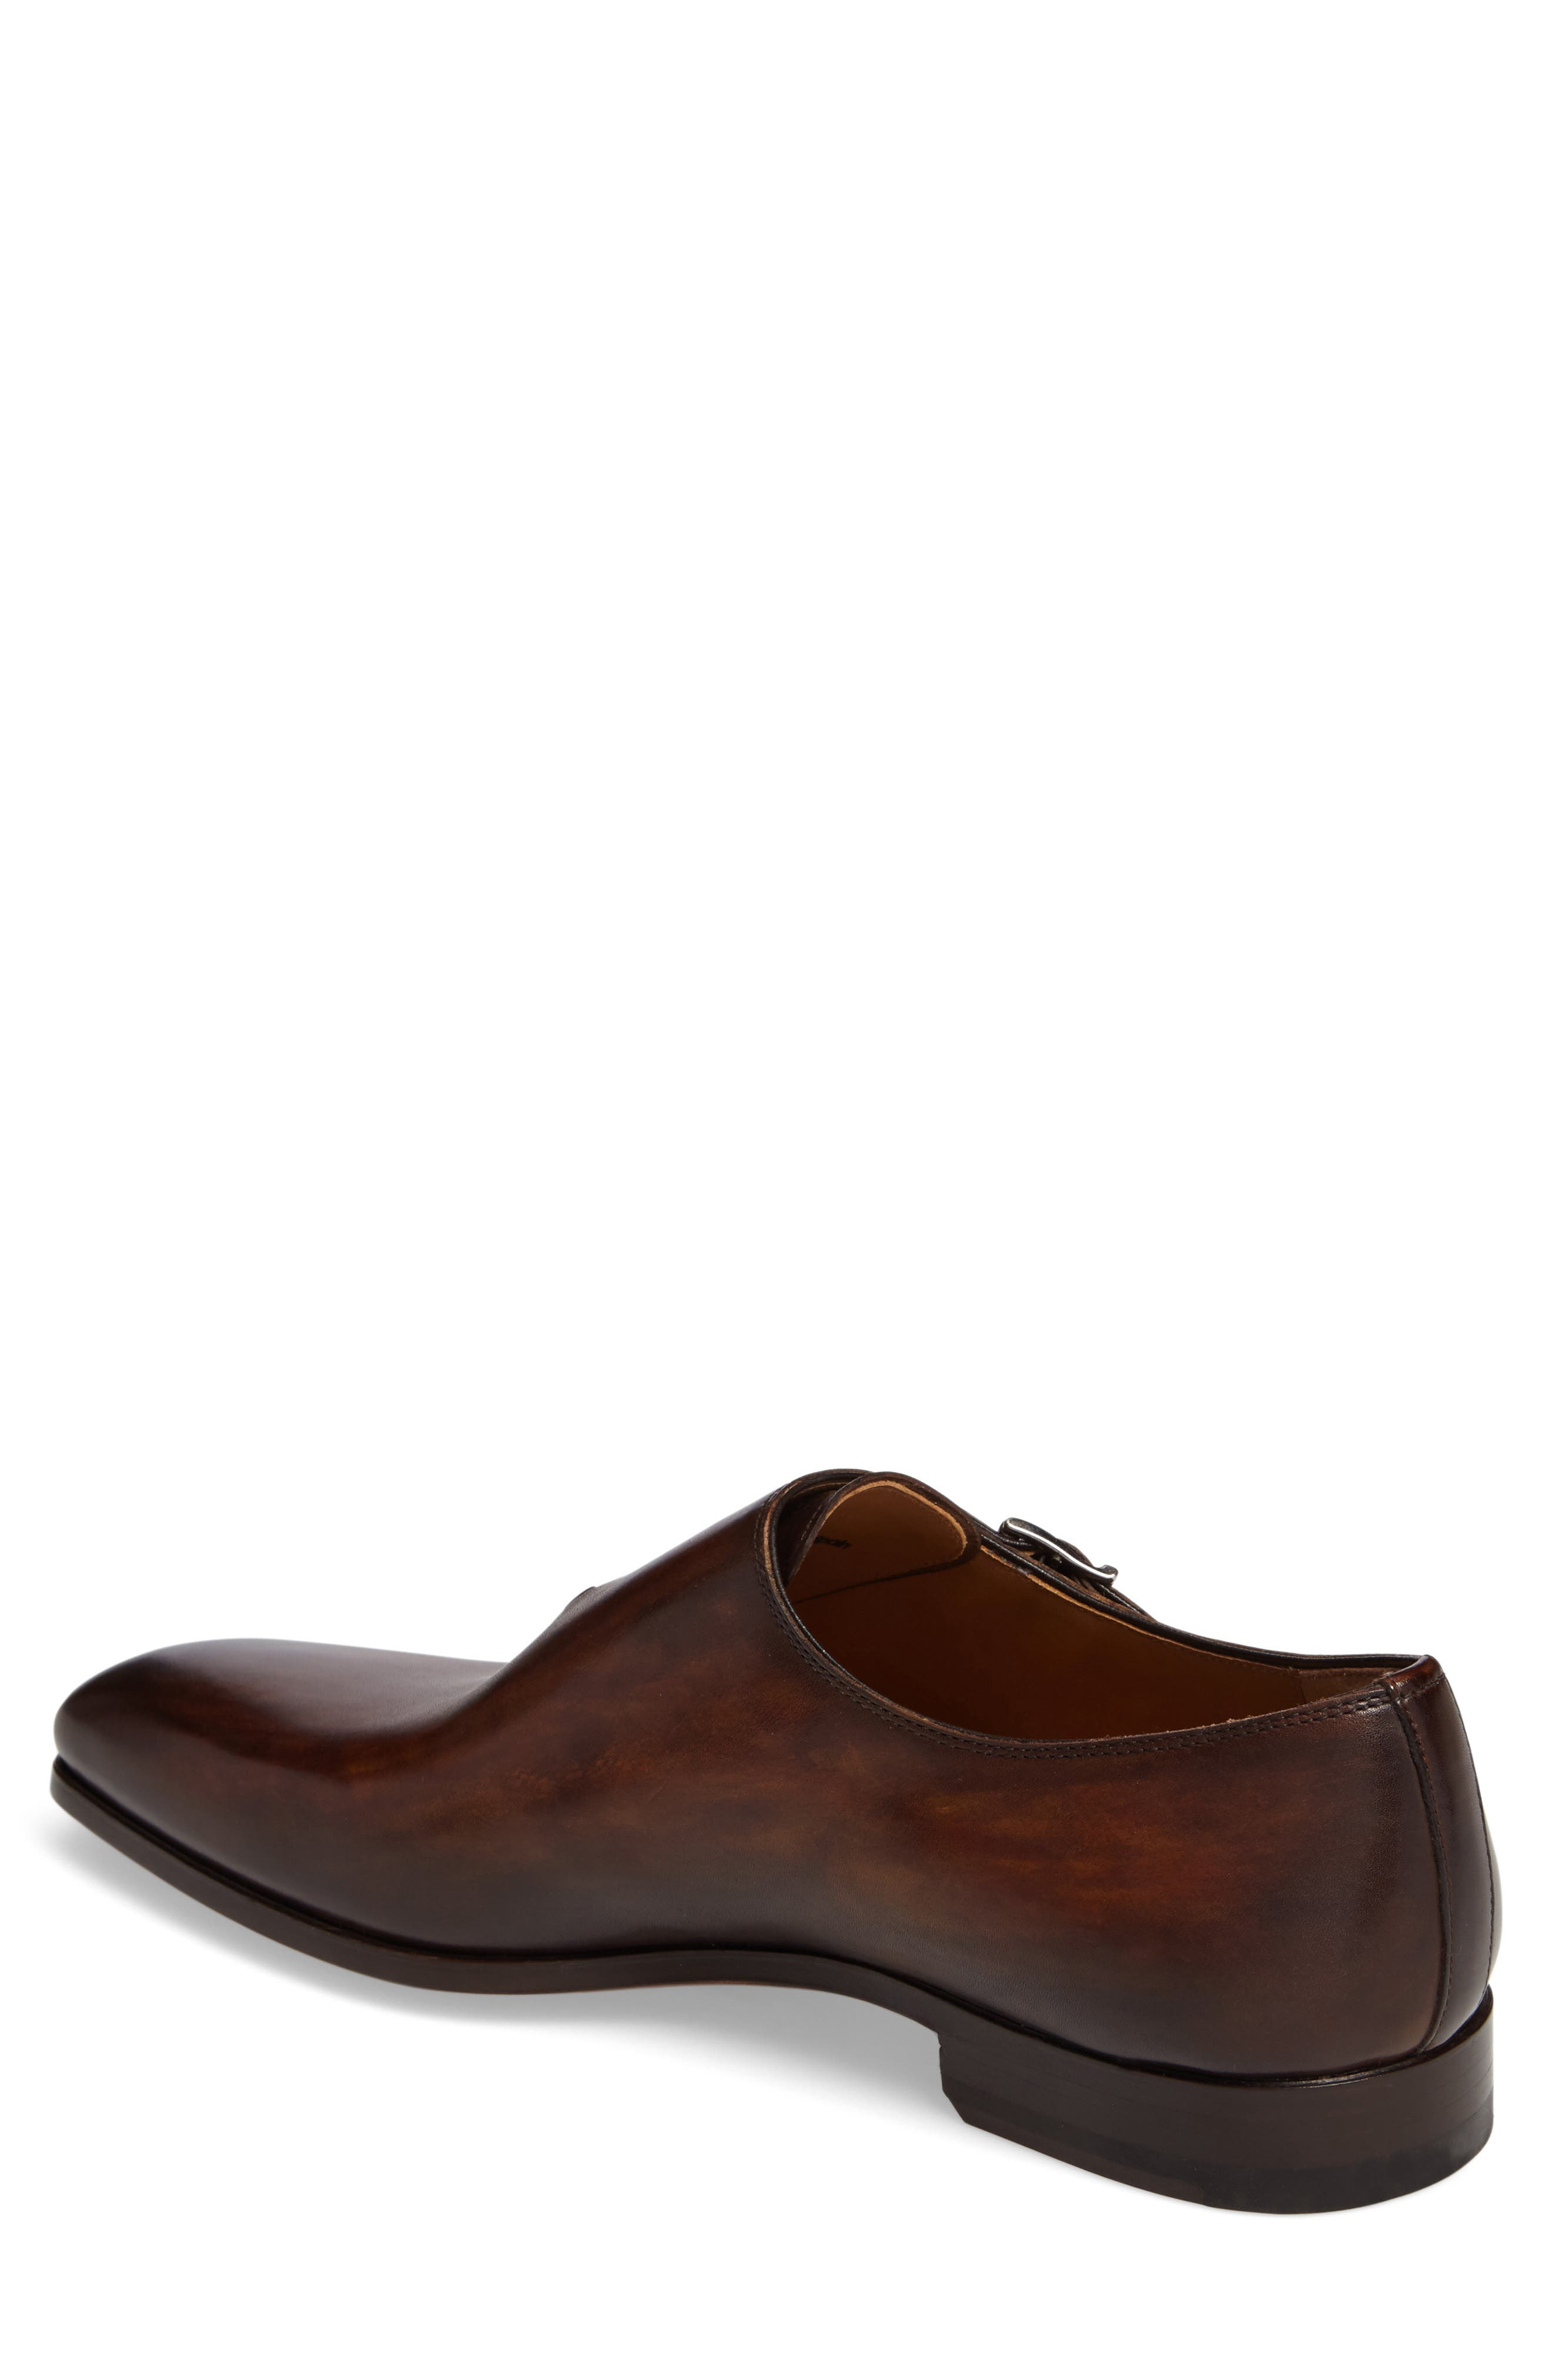 Jamin Double Monk Strap Shoe,                             Alternate thumbnail 3, color,